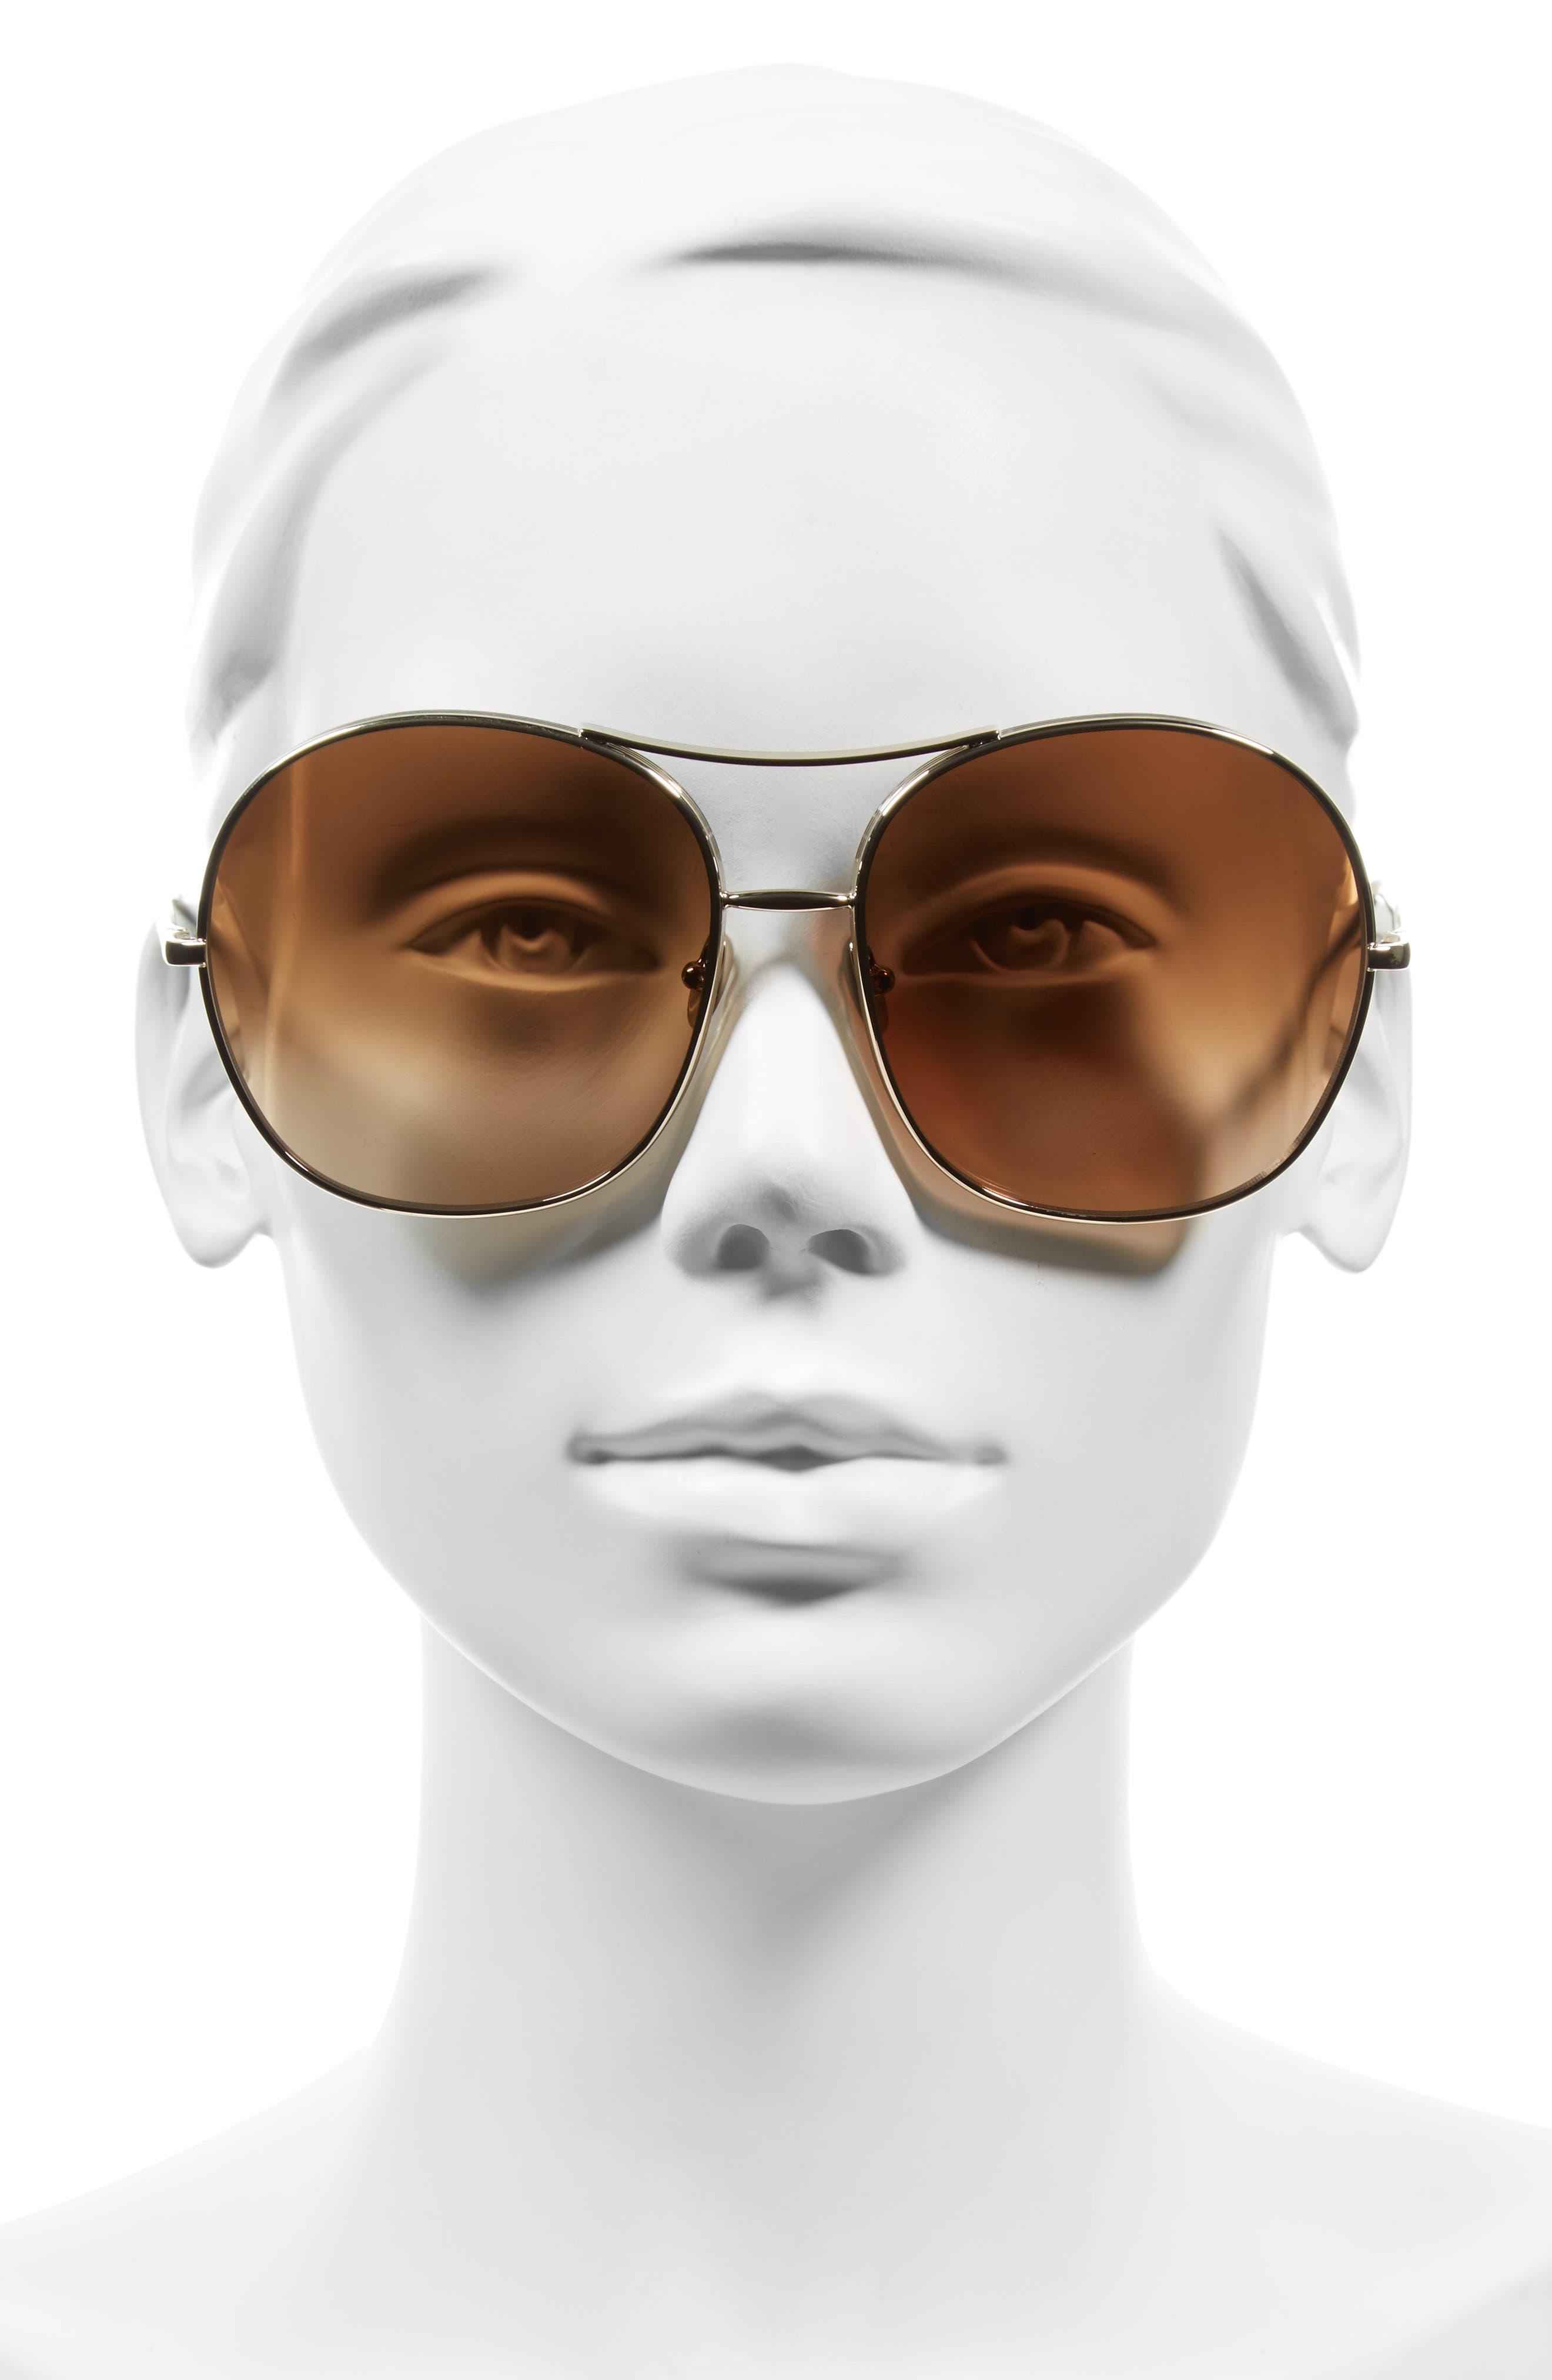 61mm Oversize Aviator Sunglasses,                             Alternate thumbnail 2, color,                             710